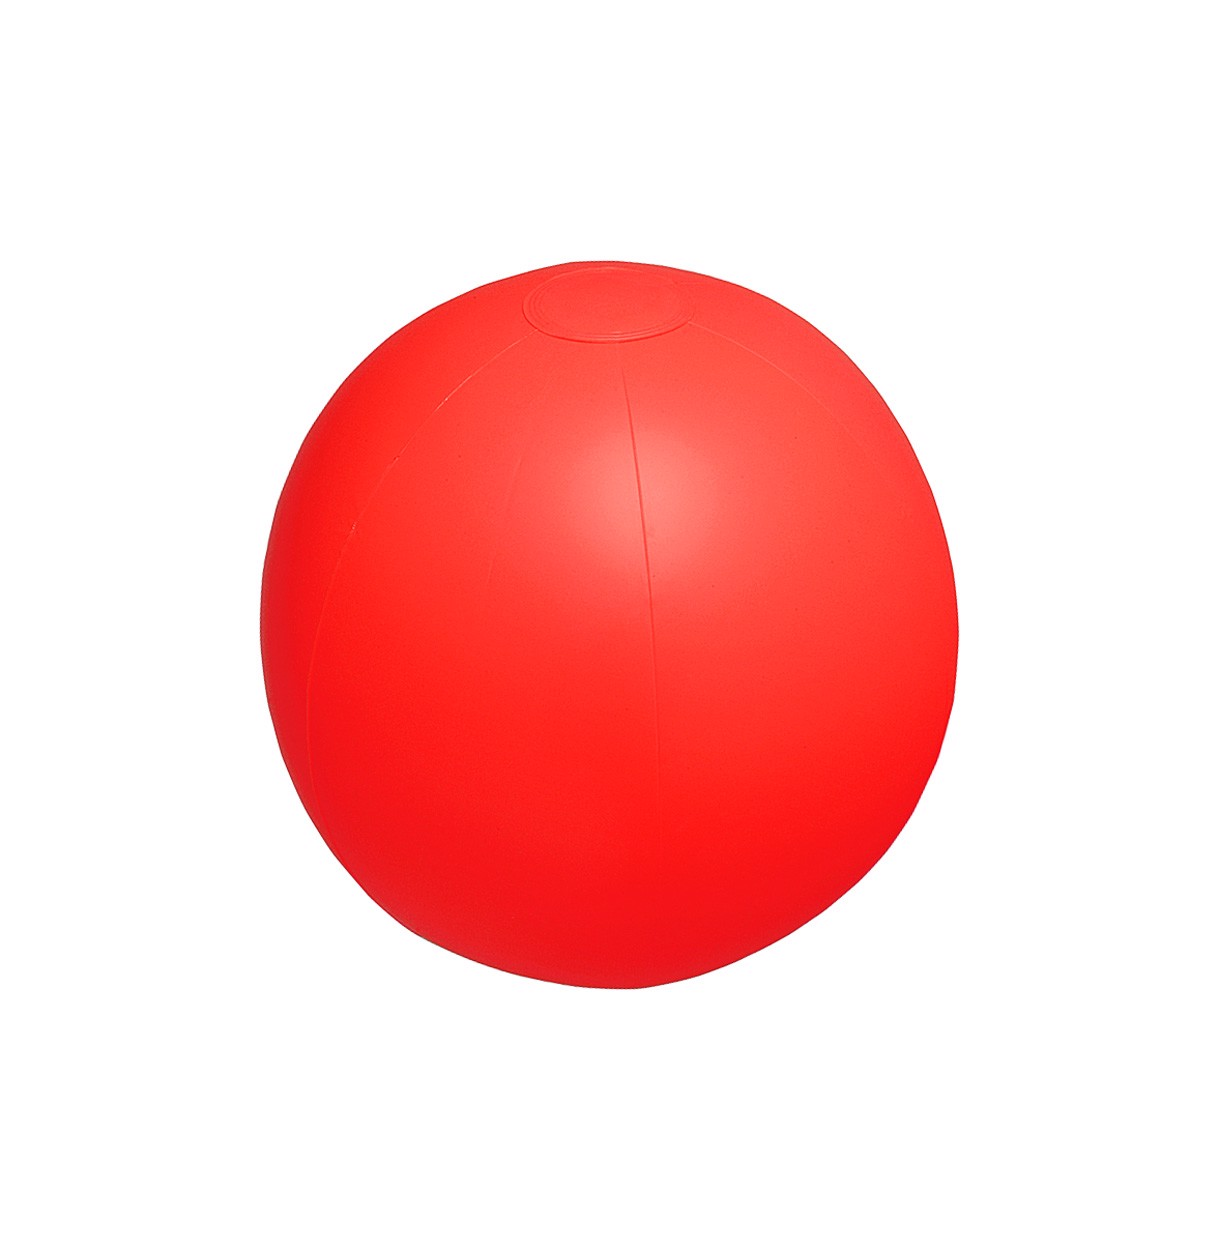 Plážový Míč (Ø28 Cm) Playo - Červená